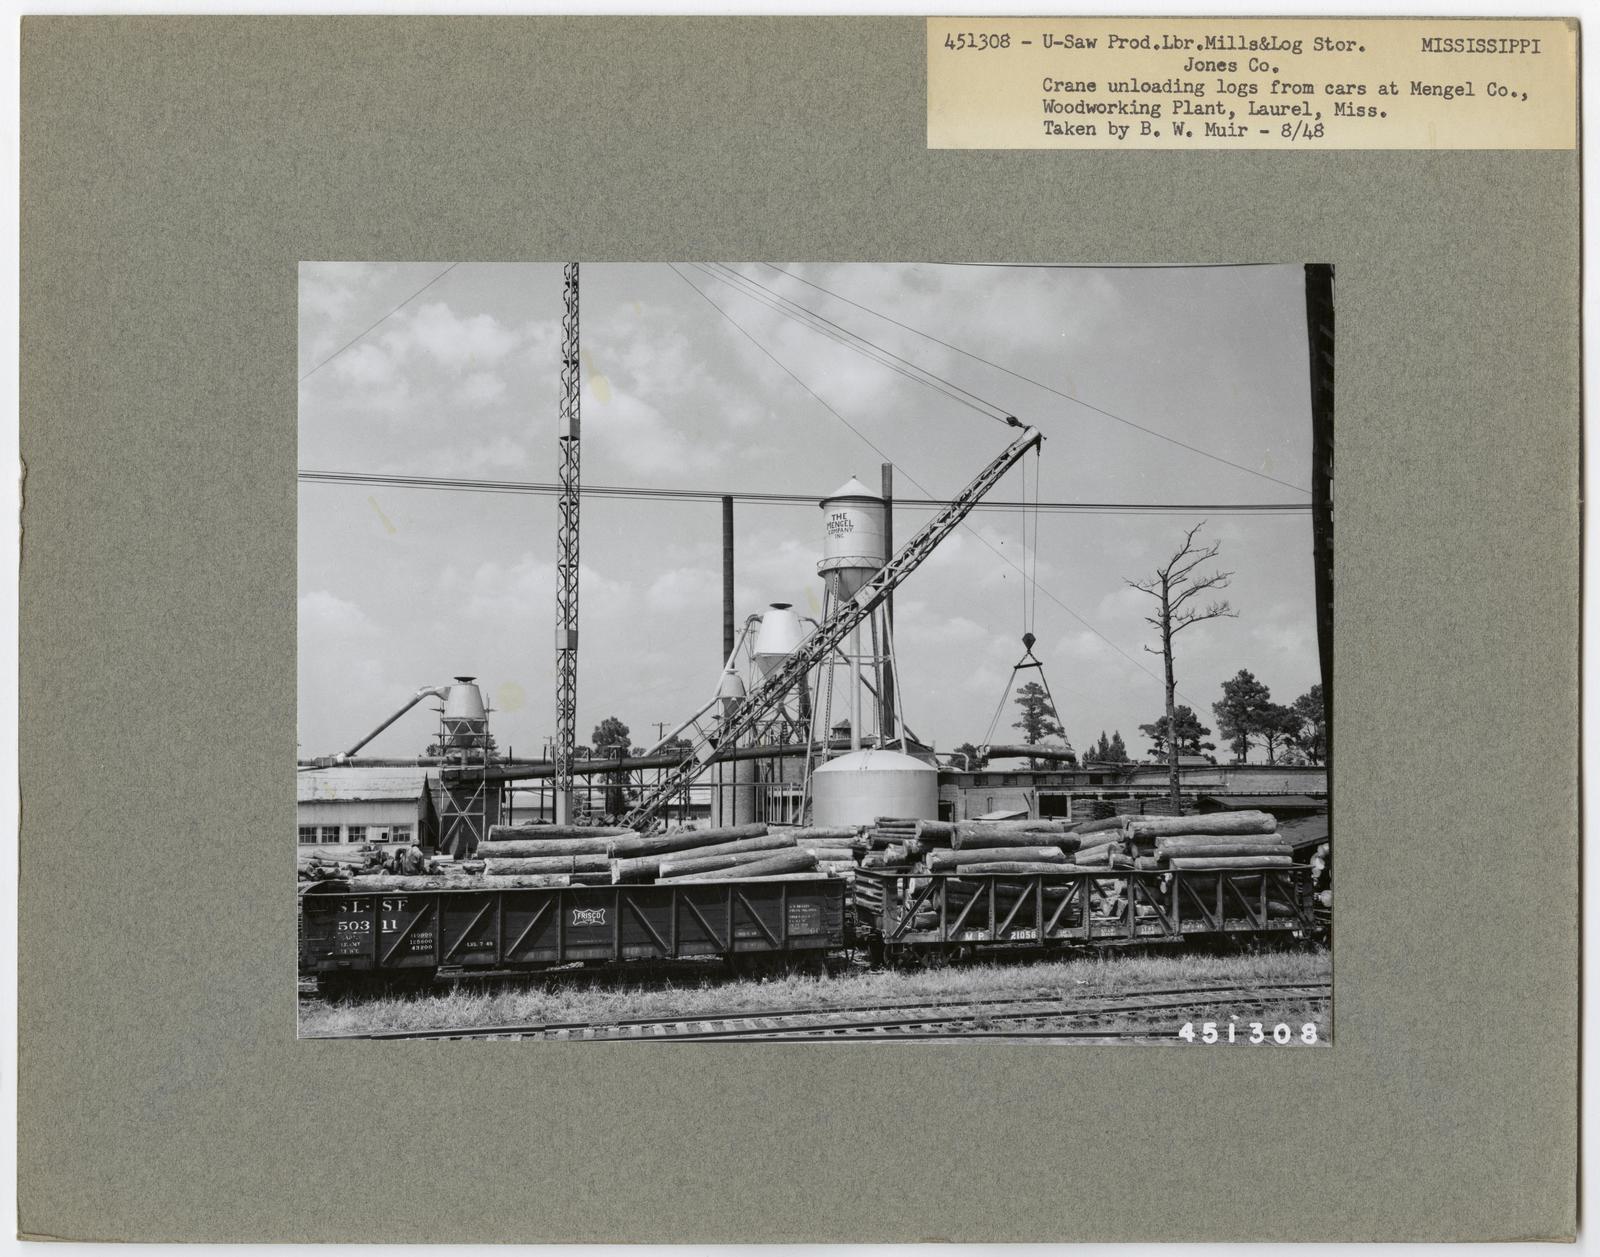 Mills, Milling and Log Storage - Mississippi